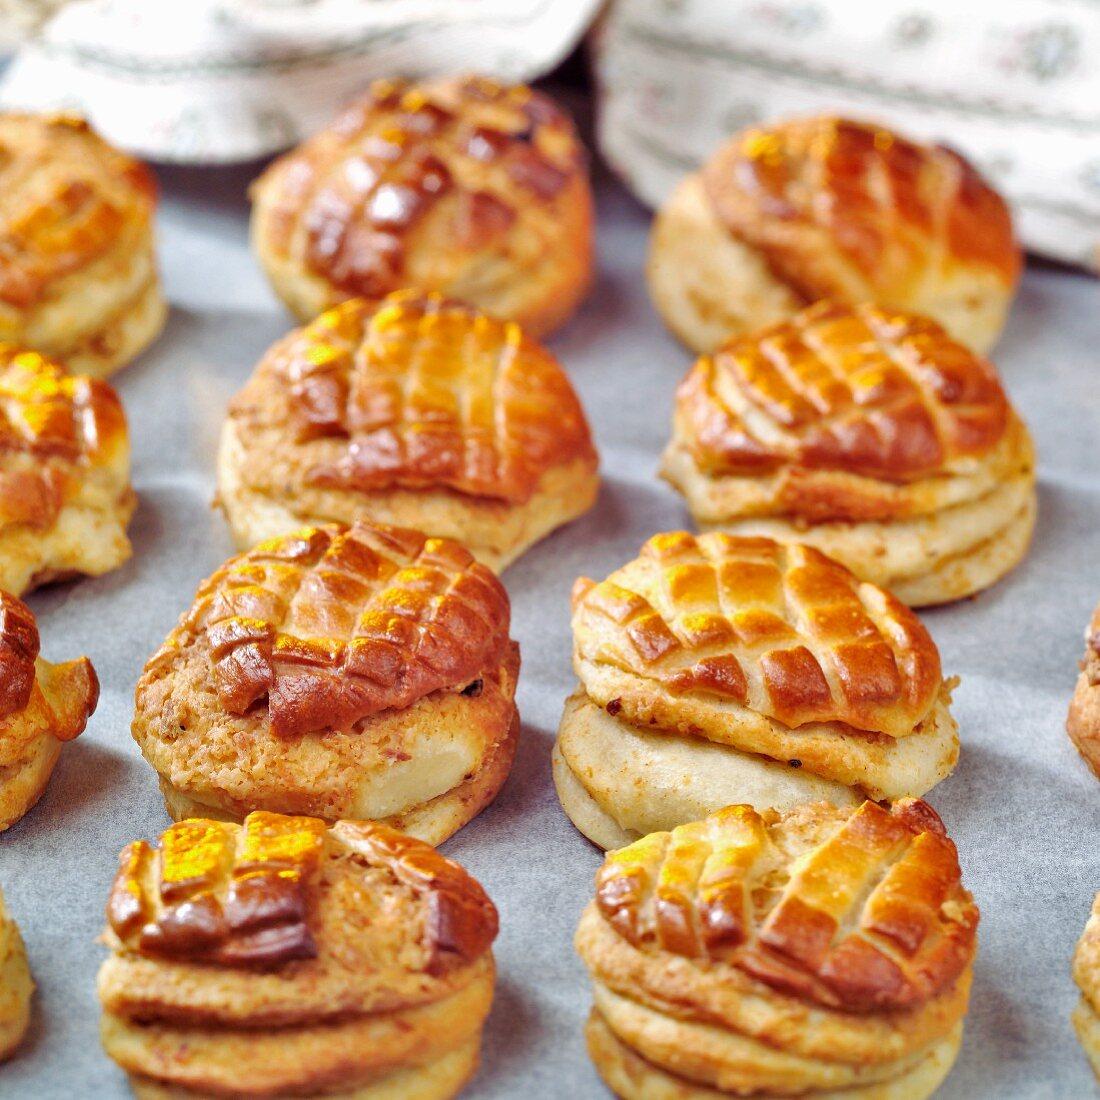 Pogácsa (Small yeast pastries, Hungary)